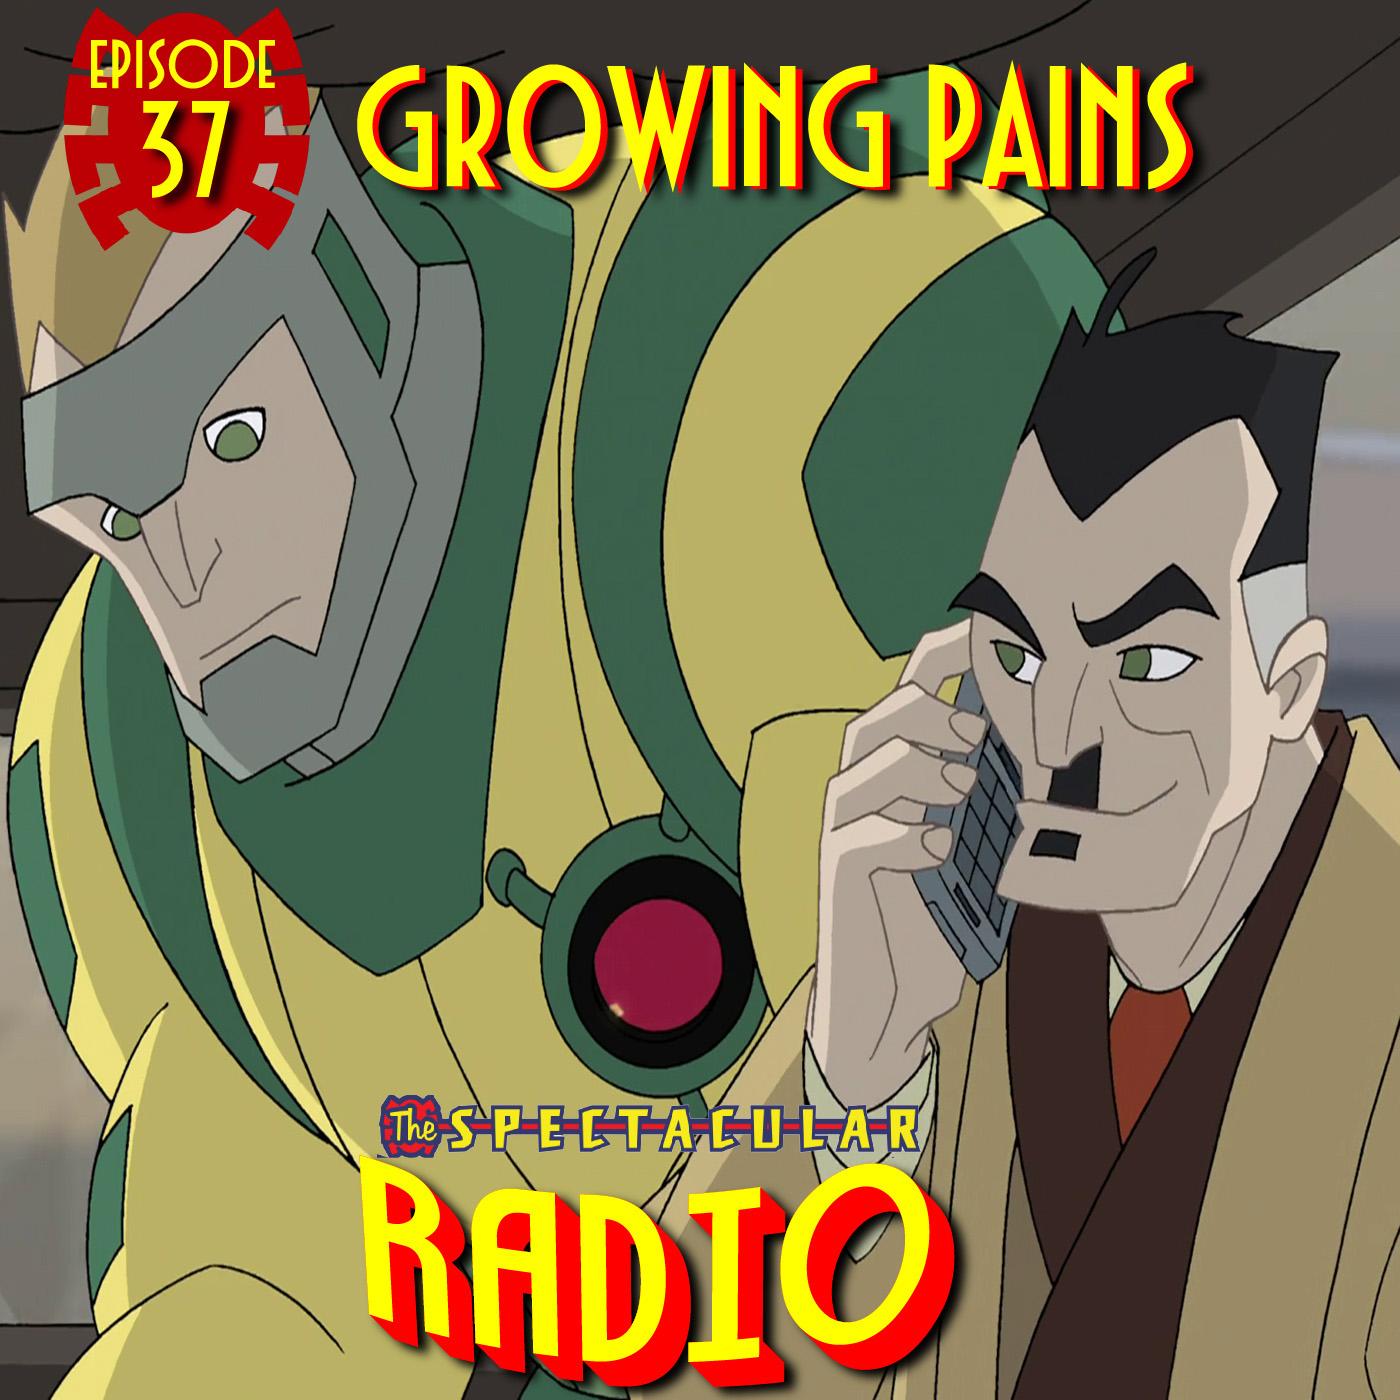 "Spectacular Radio Episode 37: ""Growing Pains"" With Greg Weisman & Daran Norris"